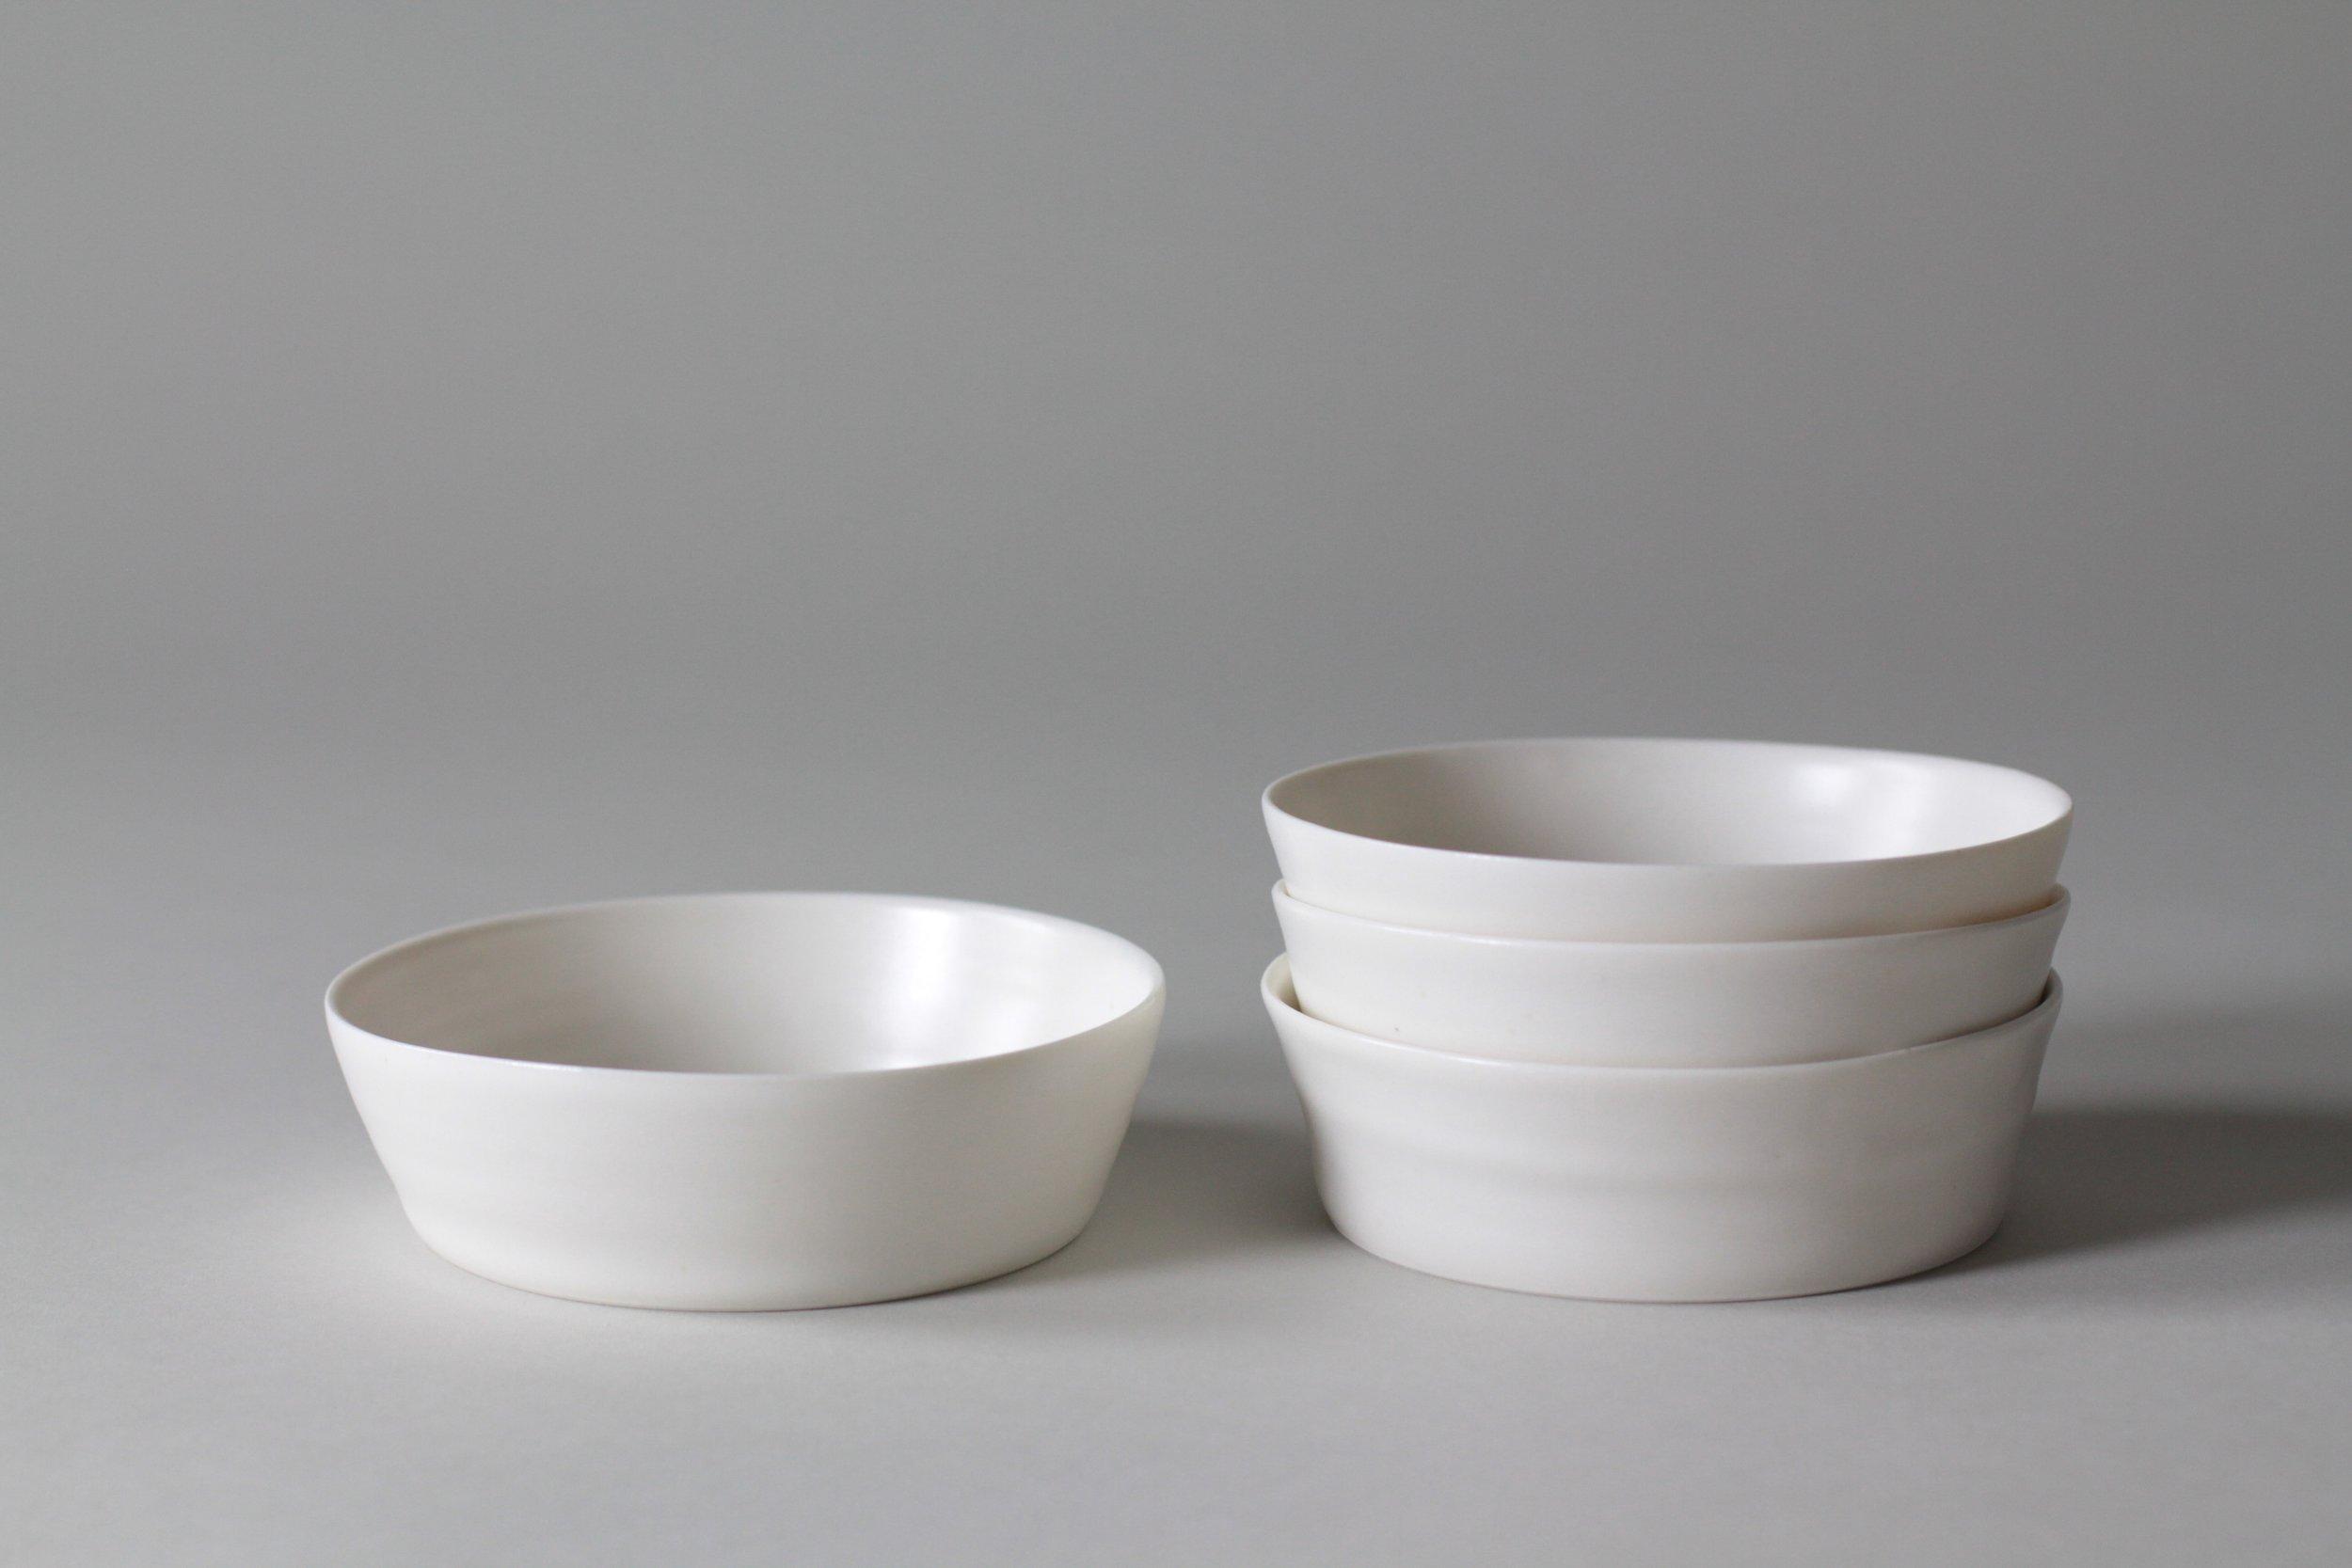 Porcelain ceramic white bowl by Lilith Rockett, Portland, Oregon